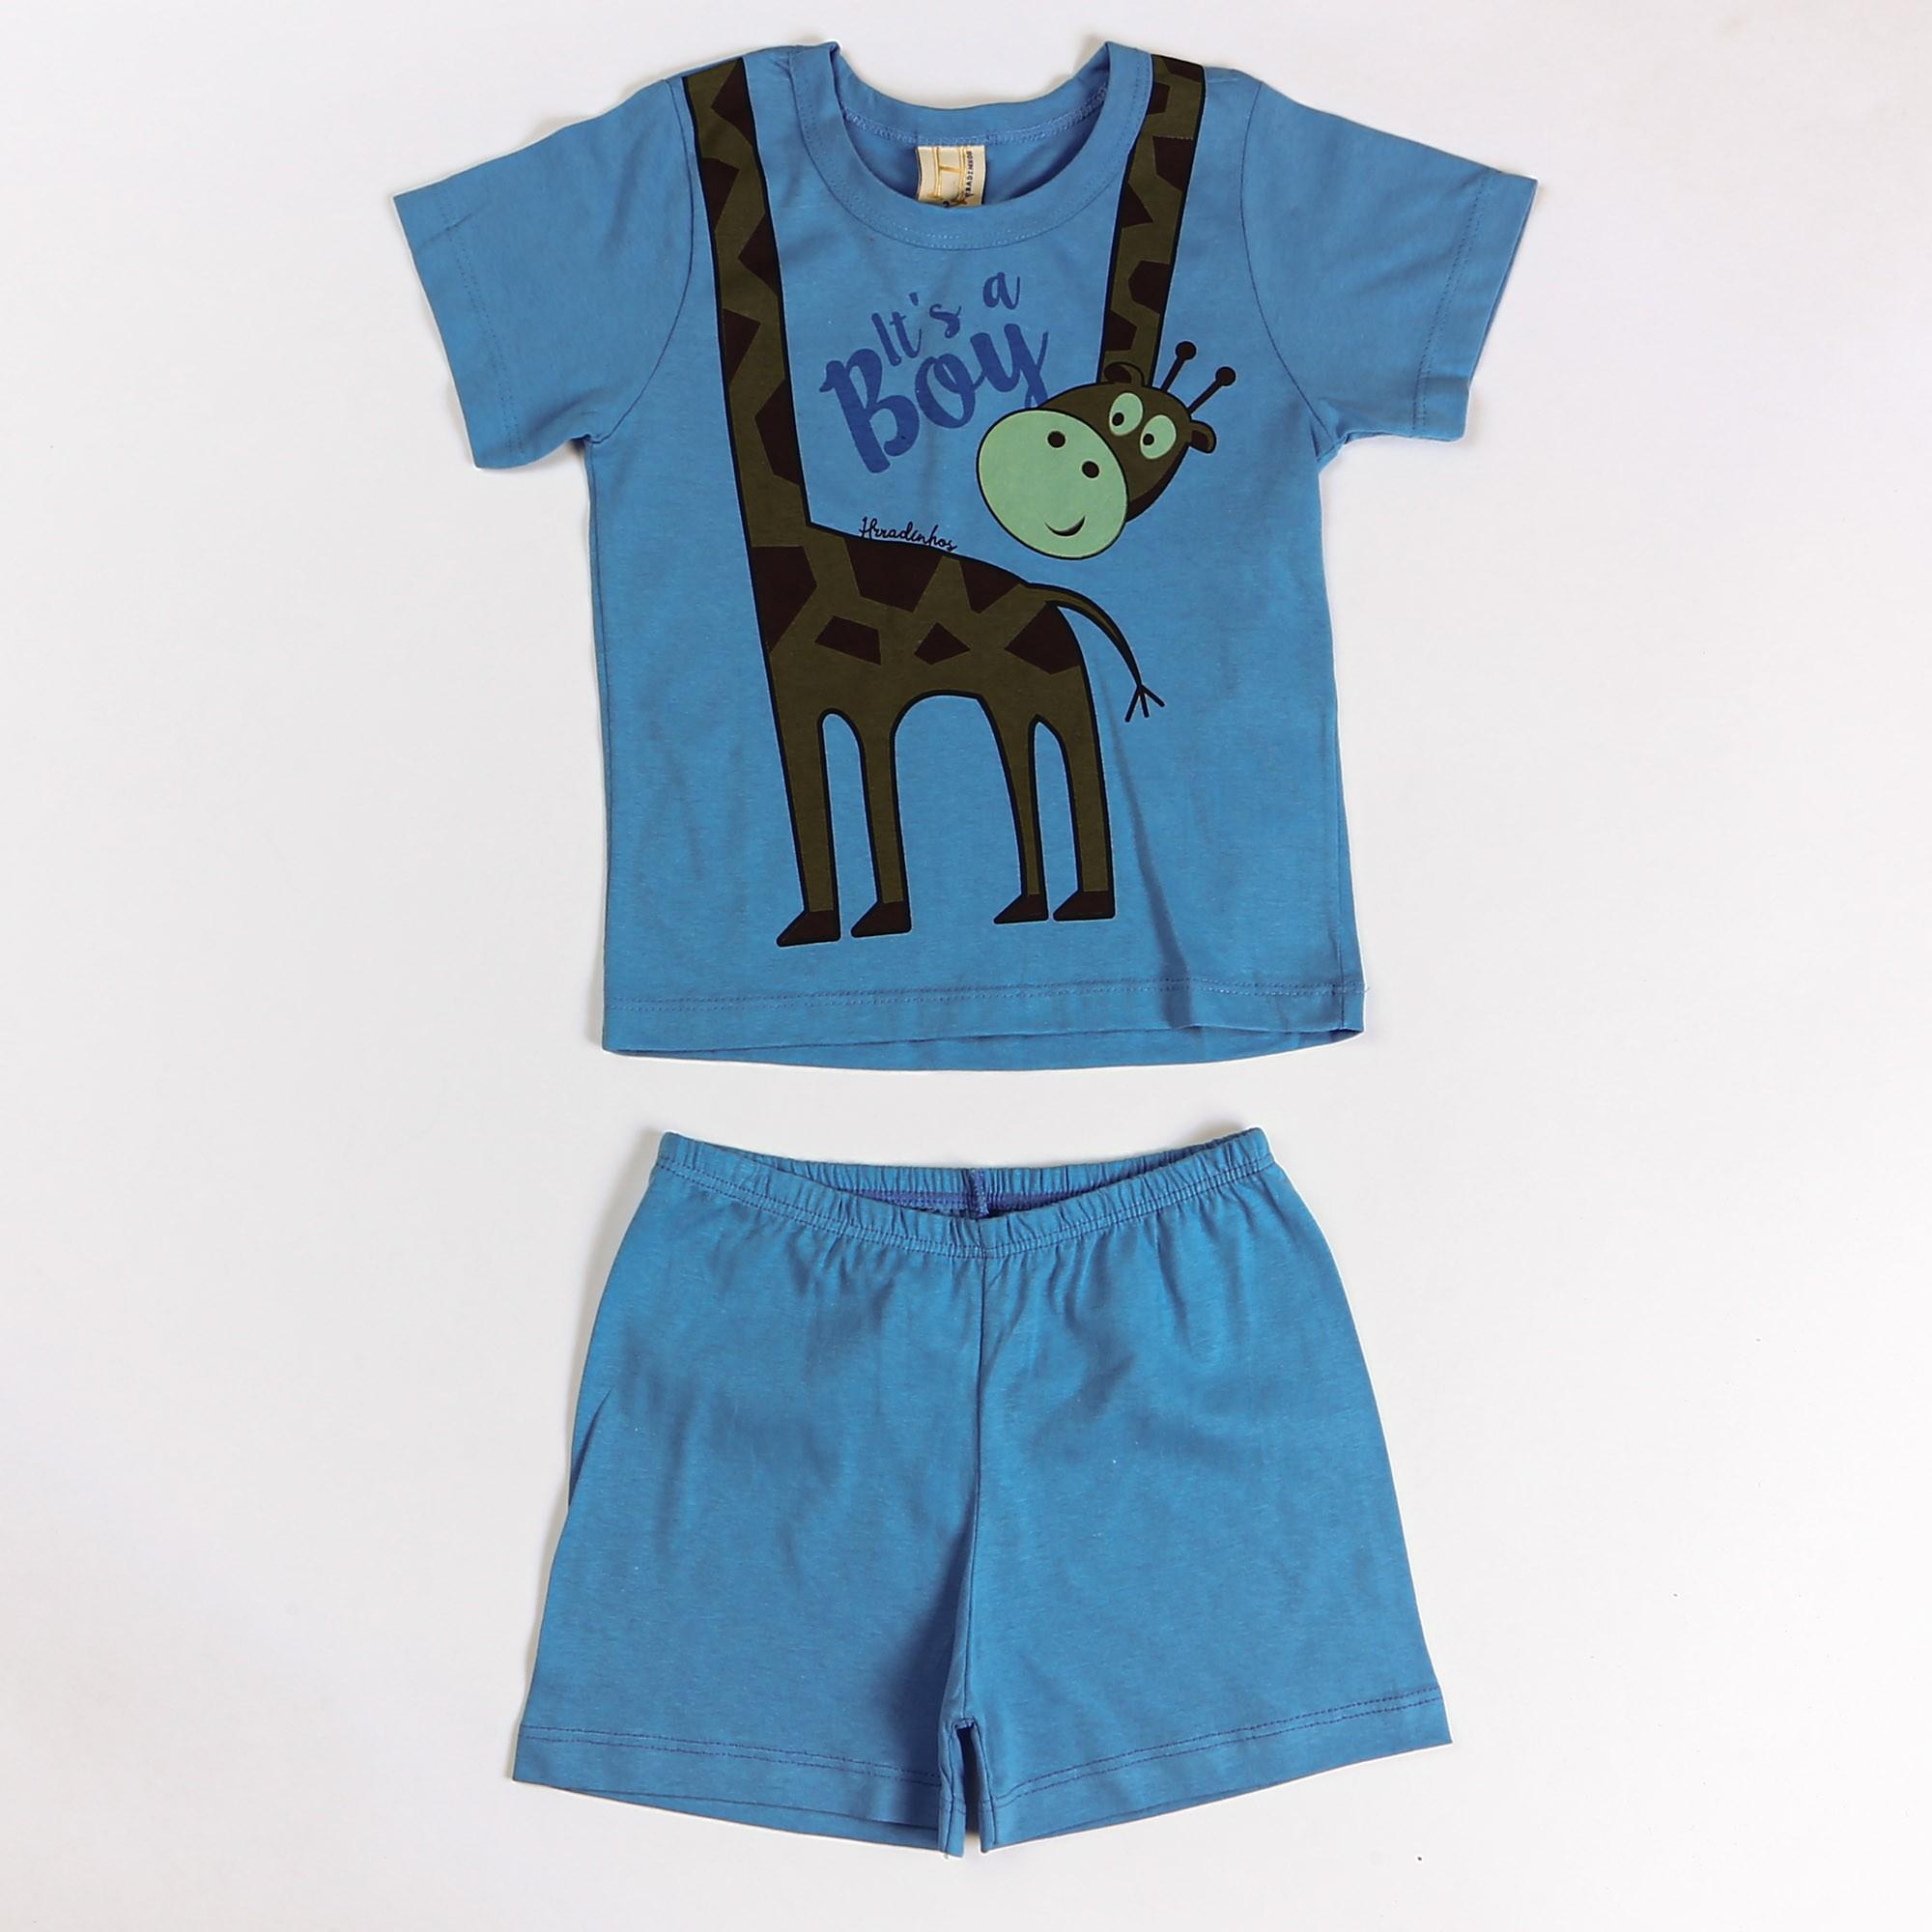 Conjunto Infantil Menino Com Camiseta Desenho Girafa - Hrradinhos